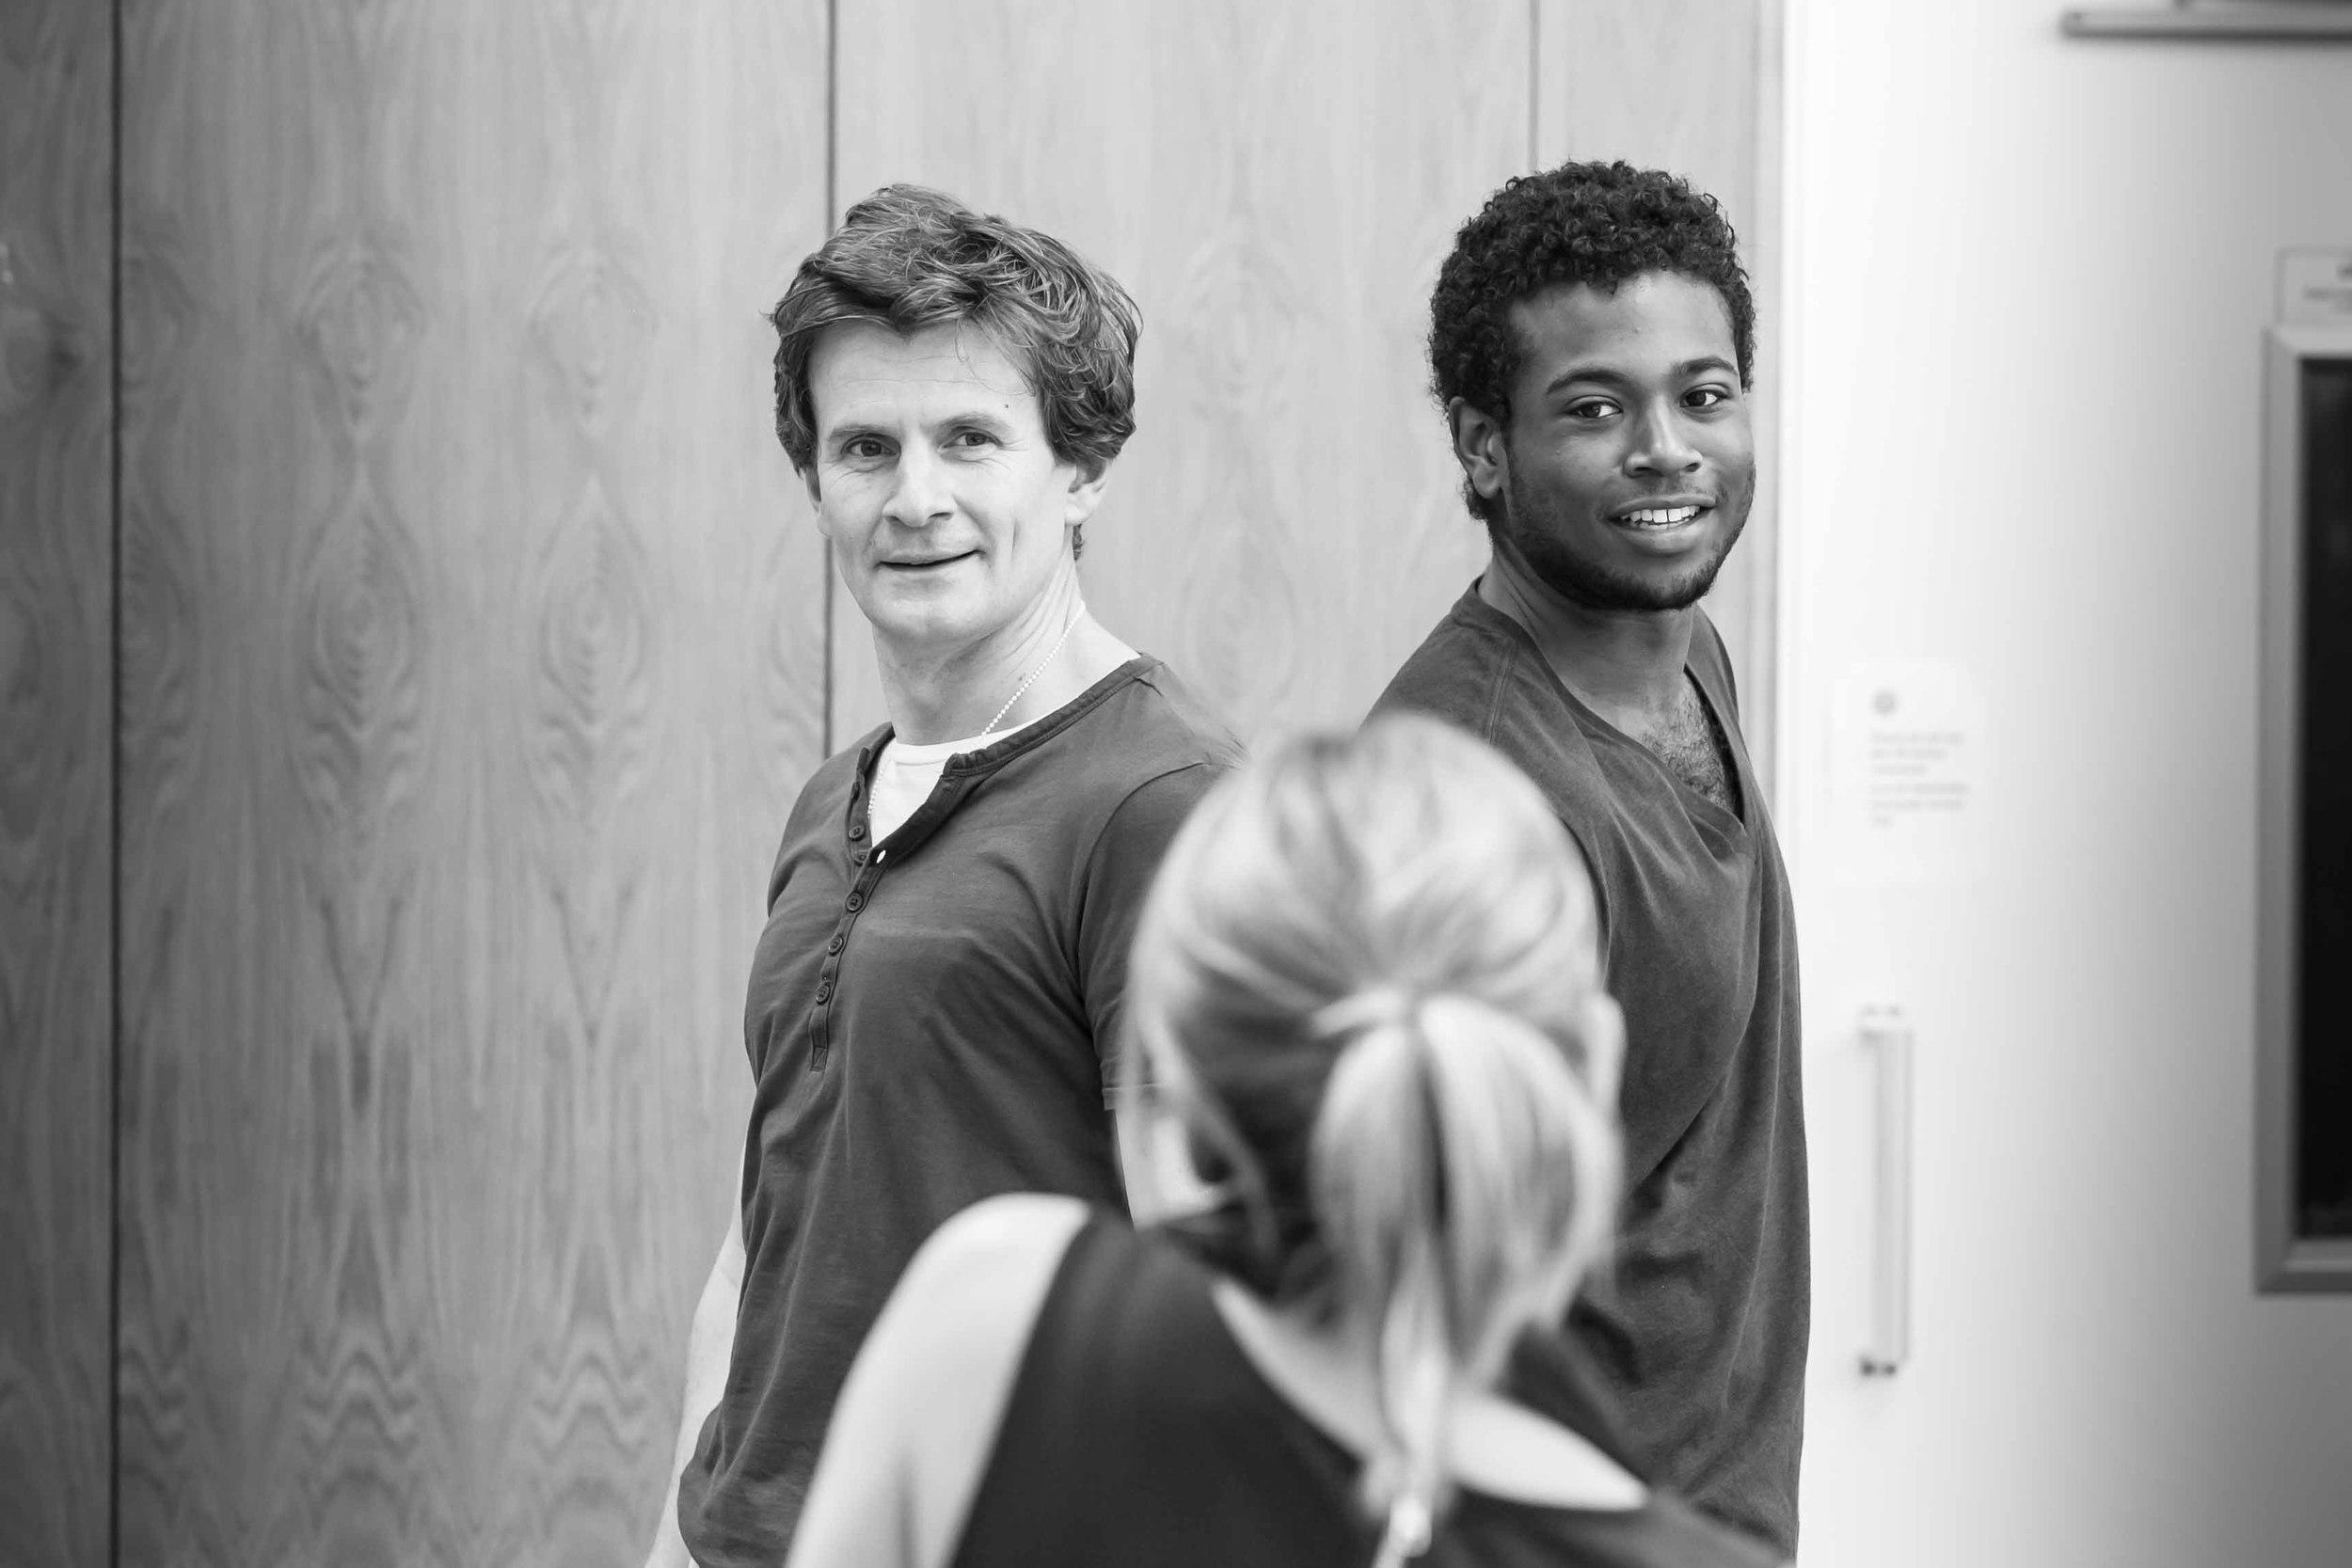 Mucha Ado About Nothing • Shakespeare's Globe • Jeremy Herrin